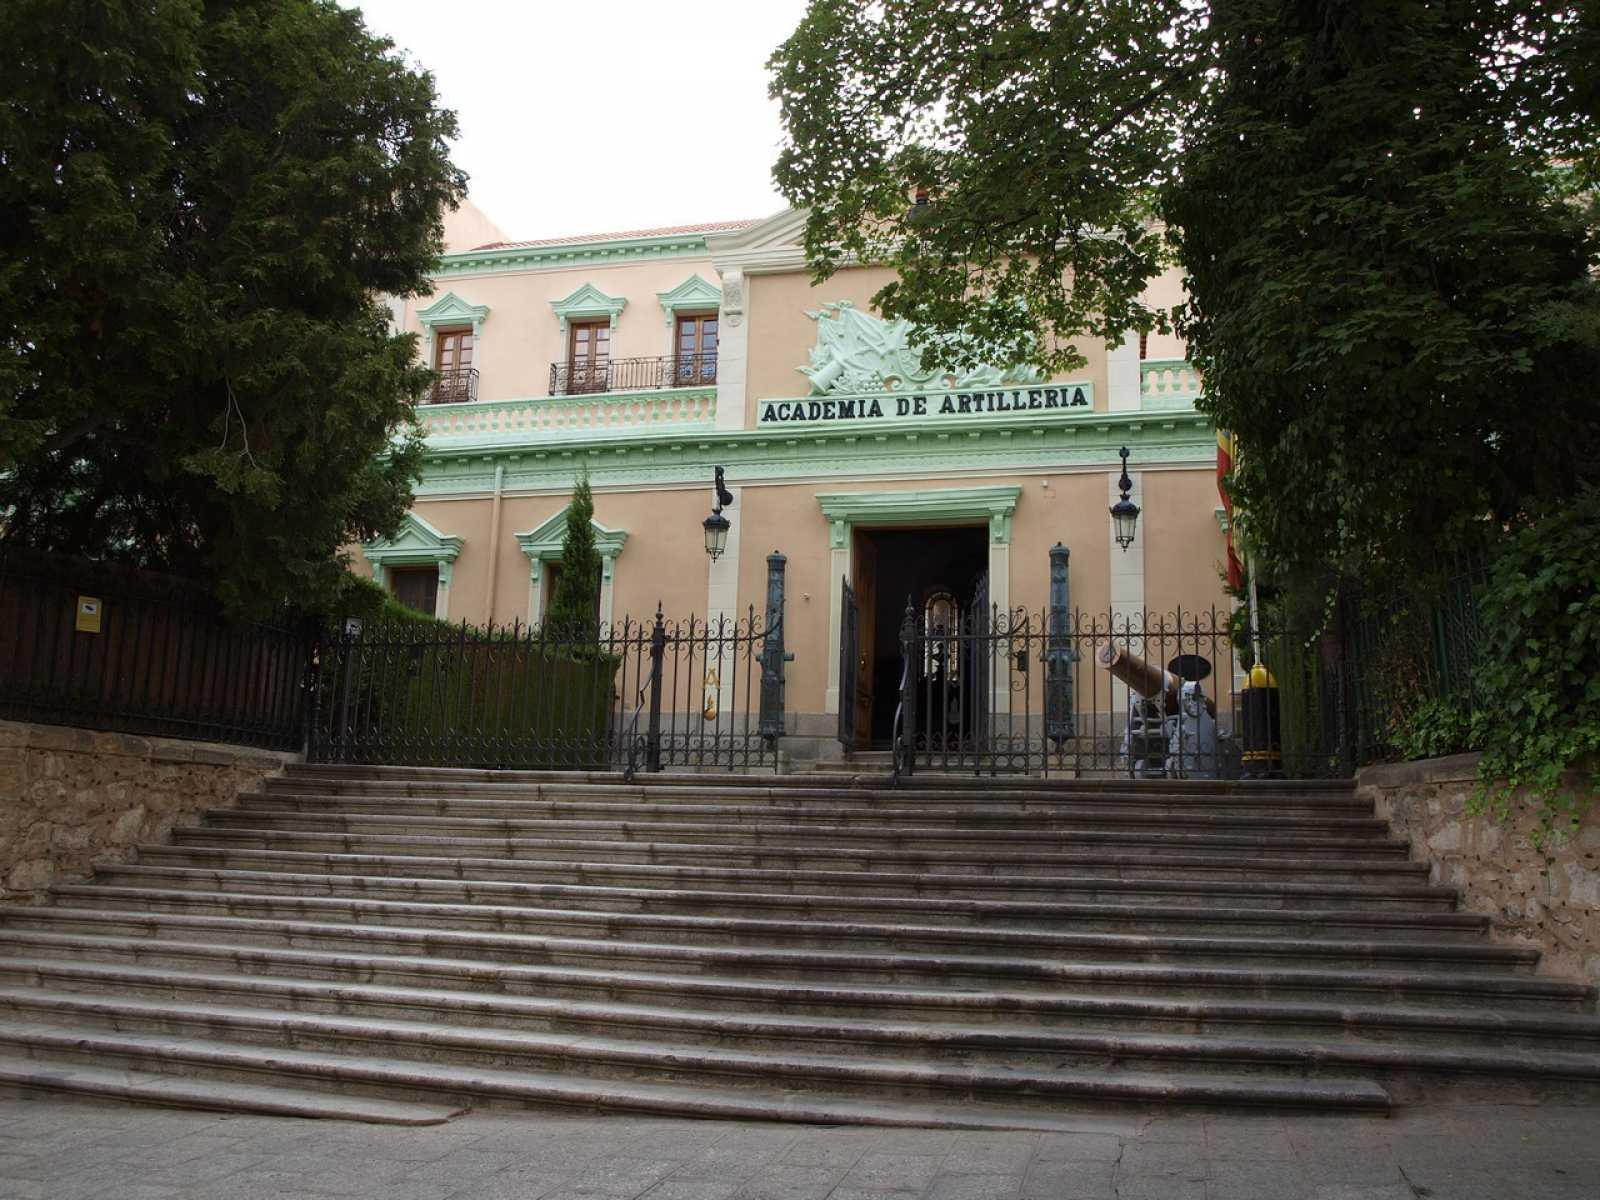 34.- Academia de Artilleria, Biblioteca. D. Angel Sanz Andres